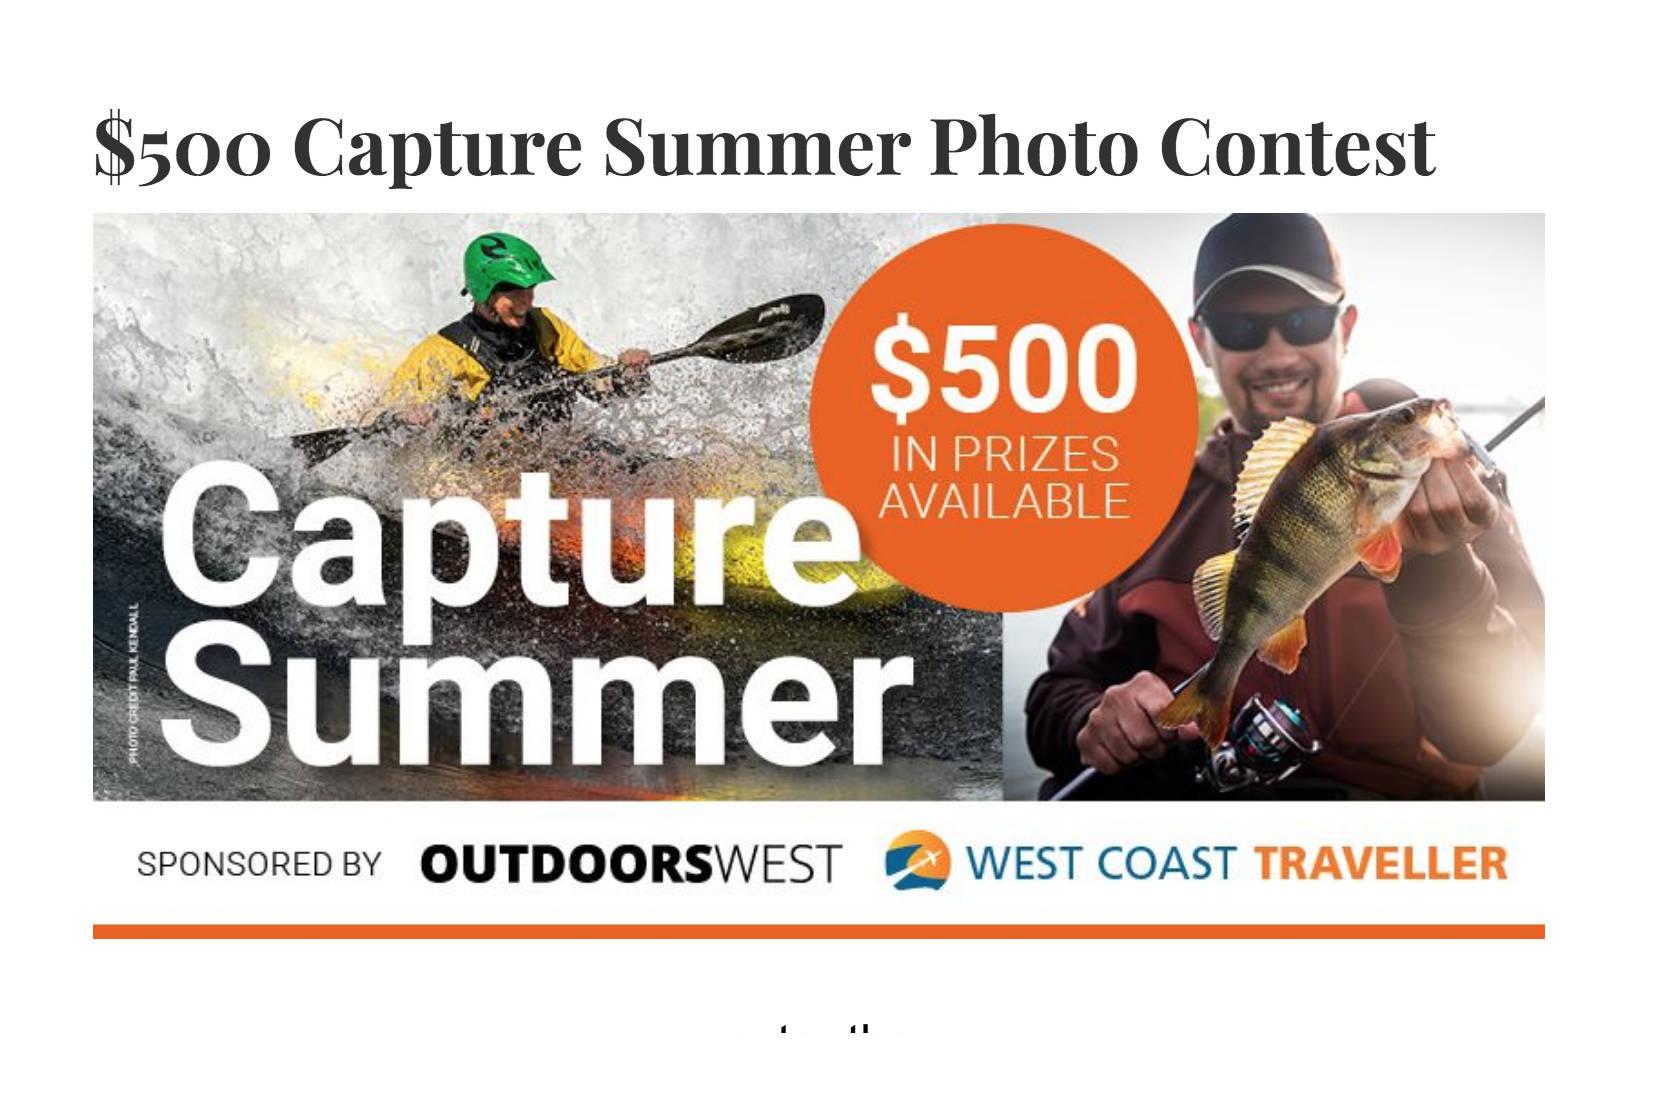 Capture Summer Photo Contest